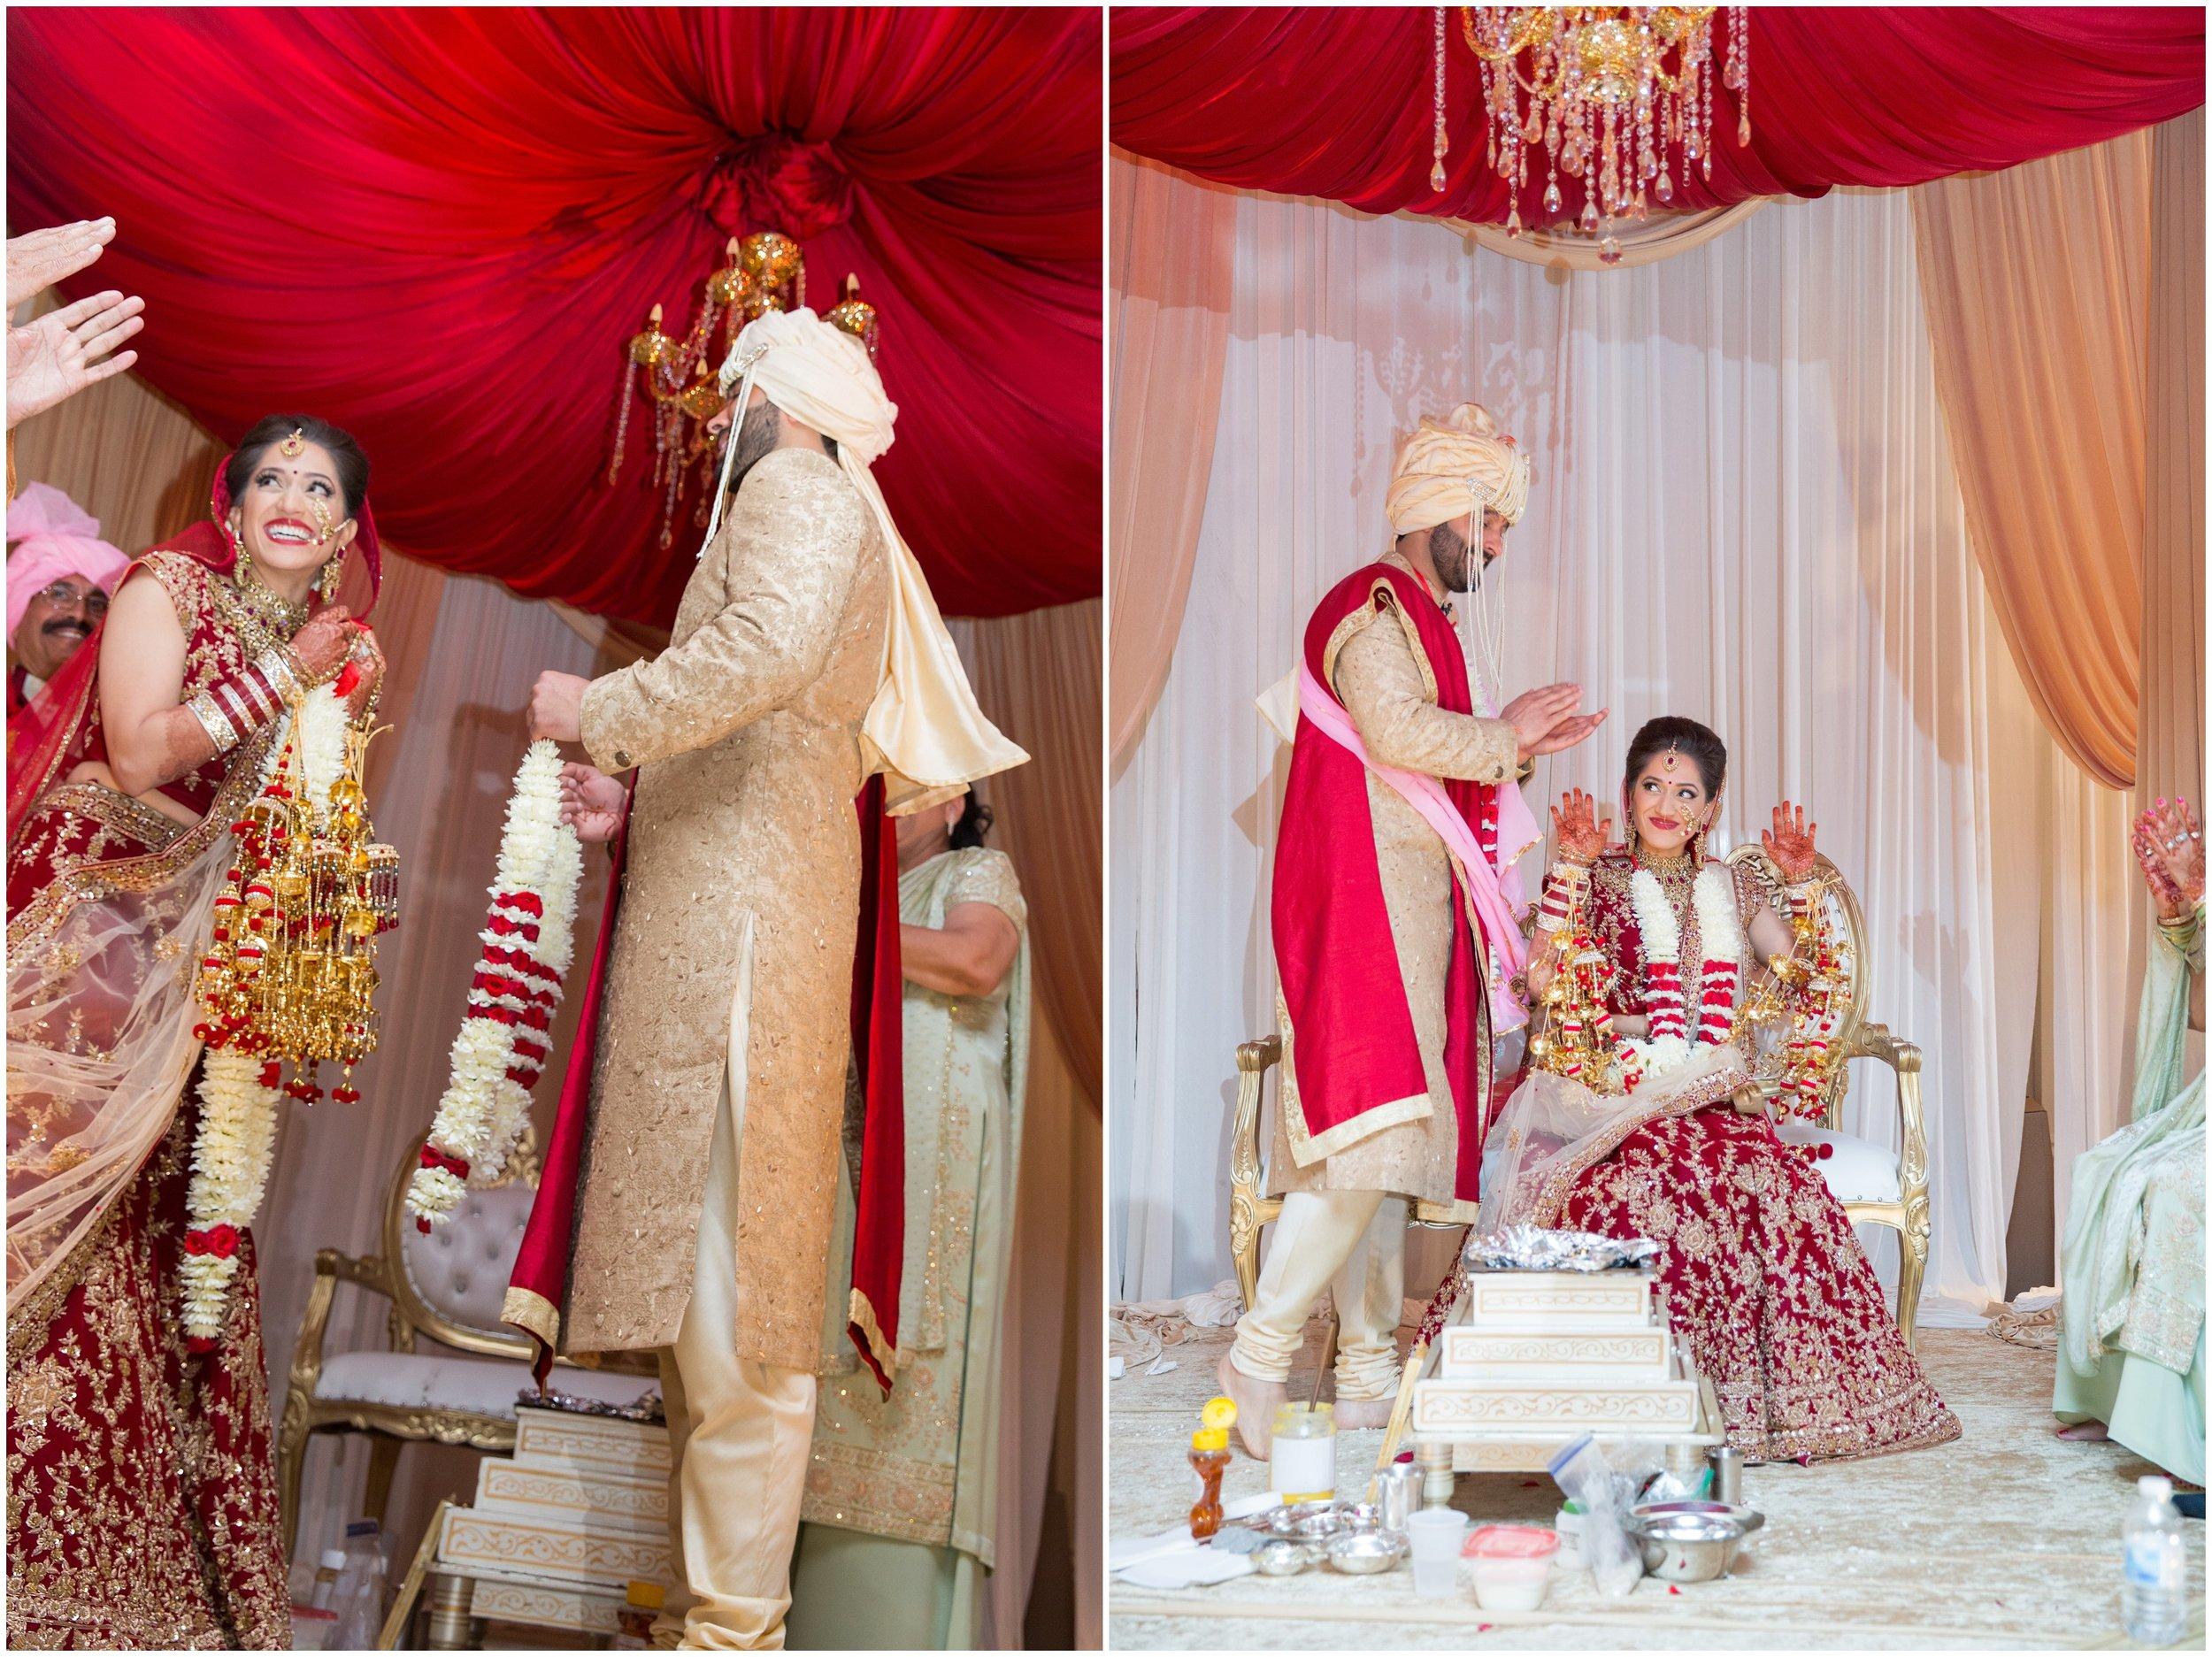 Le Cape Weddings - South Asian Wedding in Illinois - Tanvi and Anshul -9301_LuxuryDestinationPhotographer.jpg